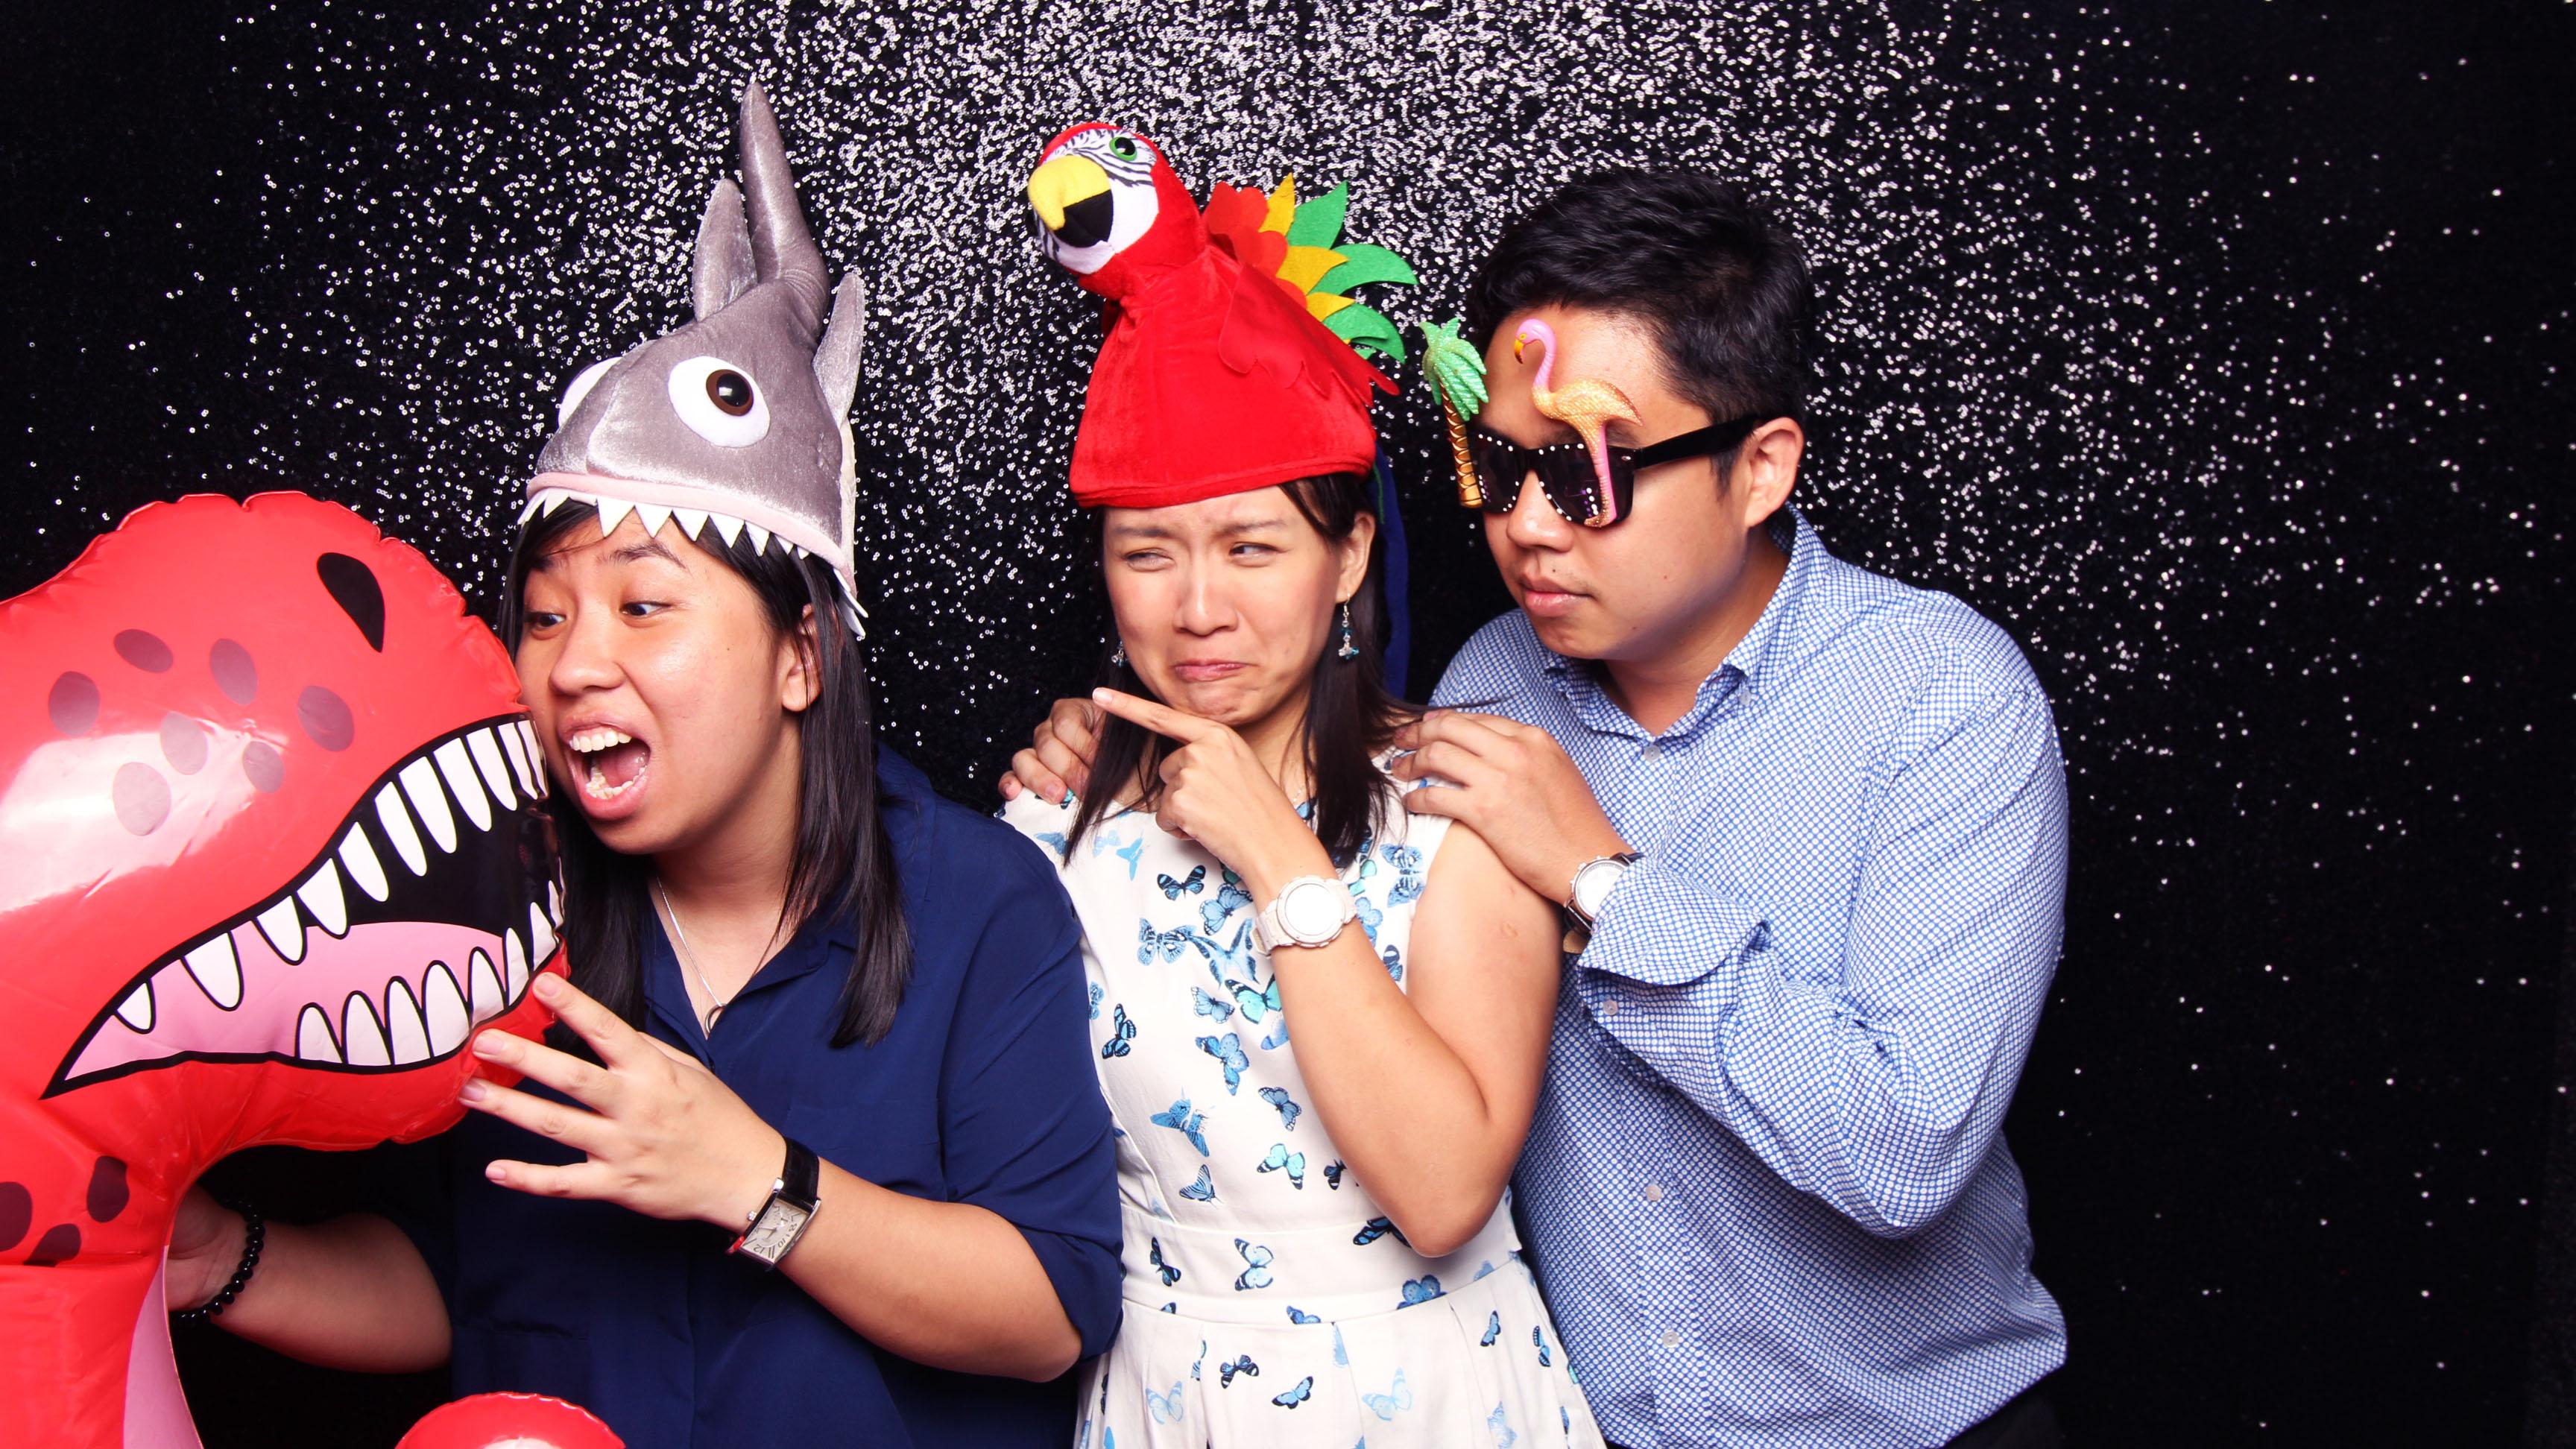 Fourstops • Singapore Photobooth • Then Yee & Justine Wedding Photobooth